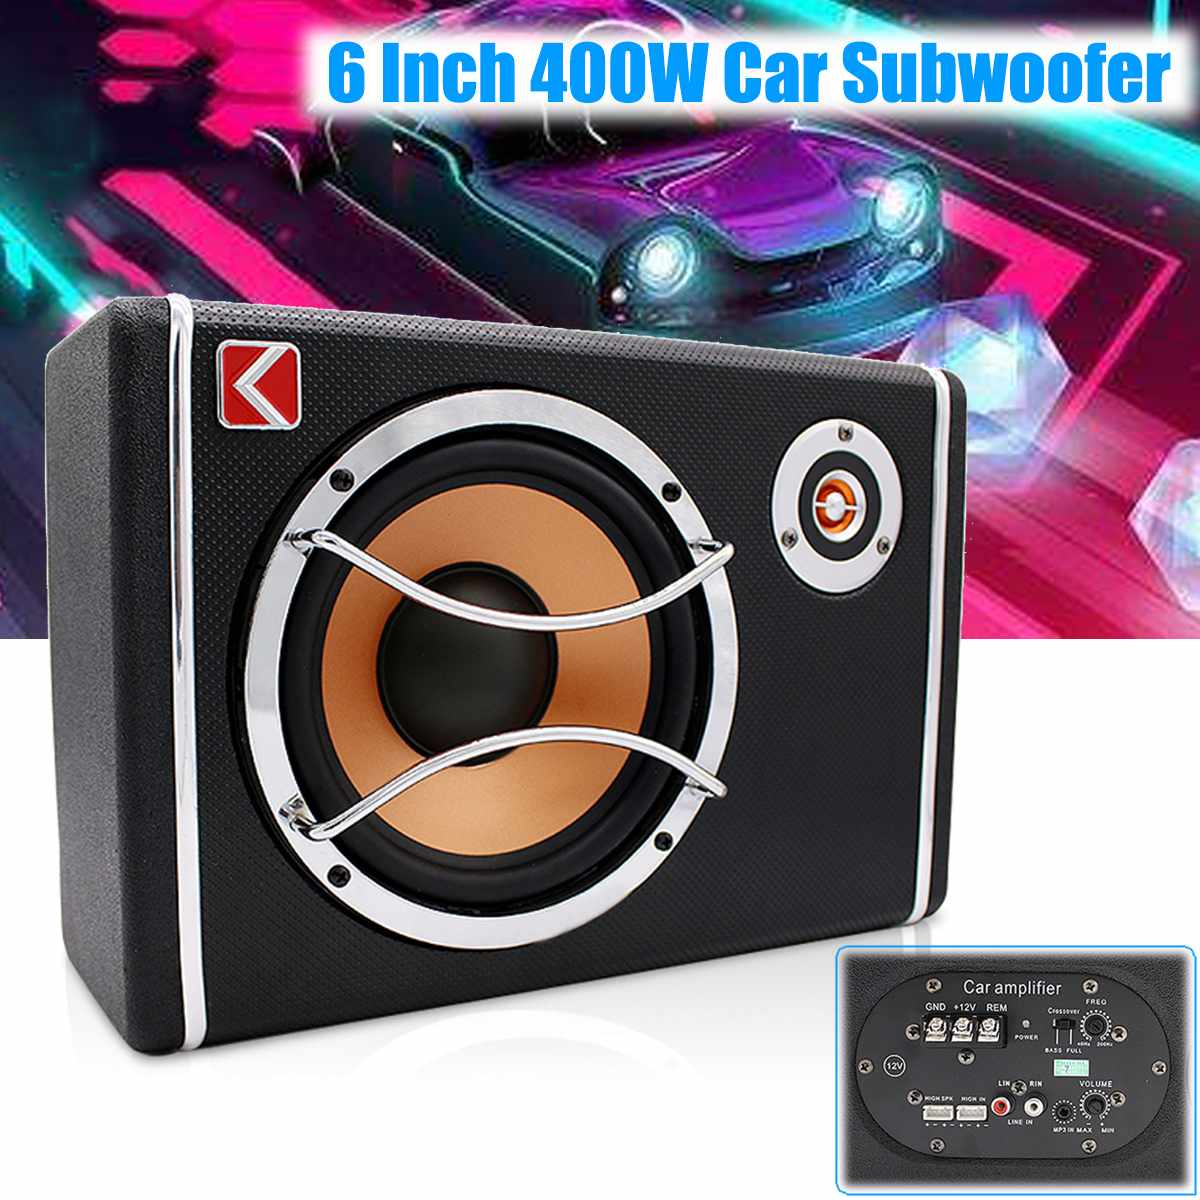 6 Inch 400W 12V Car Subwoofer Under Seat Sub Audio Speaker Music System Sound Car Speakers